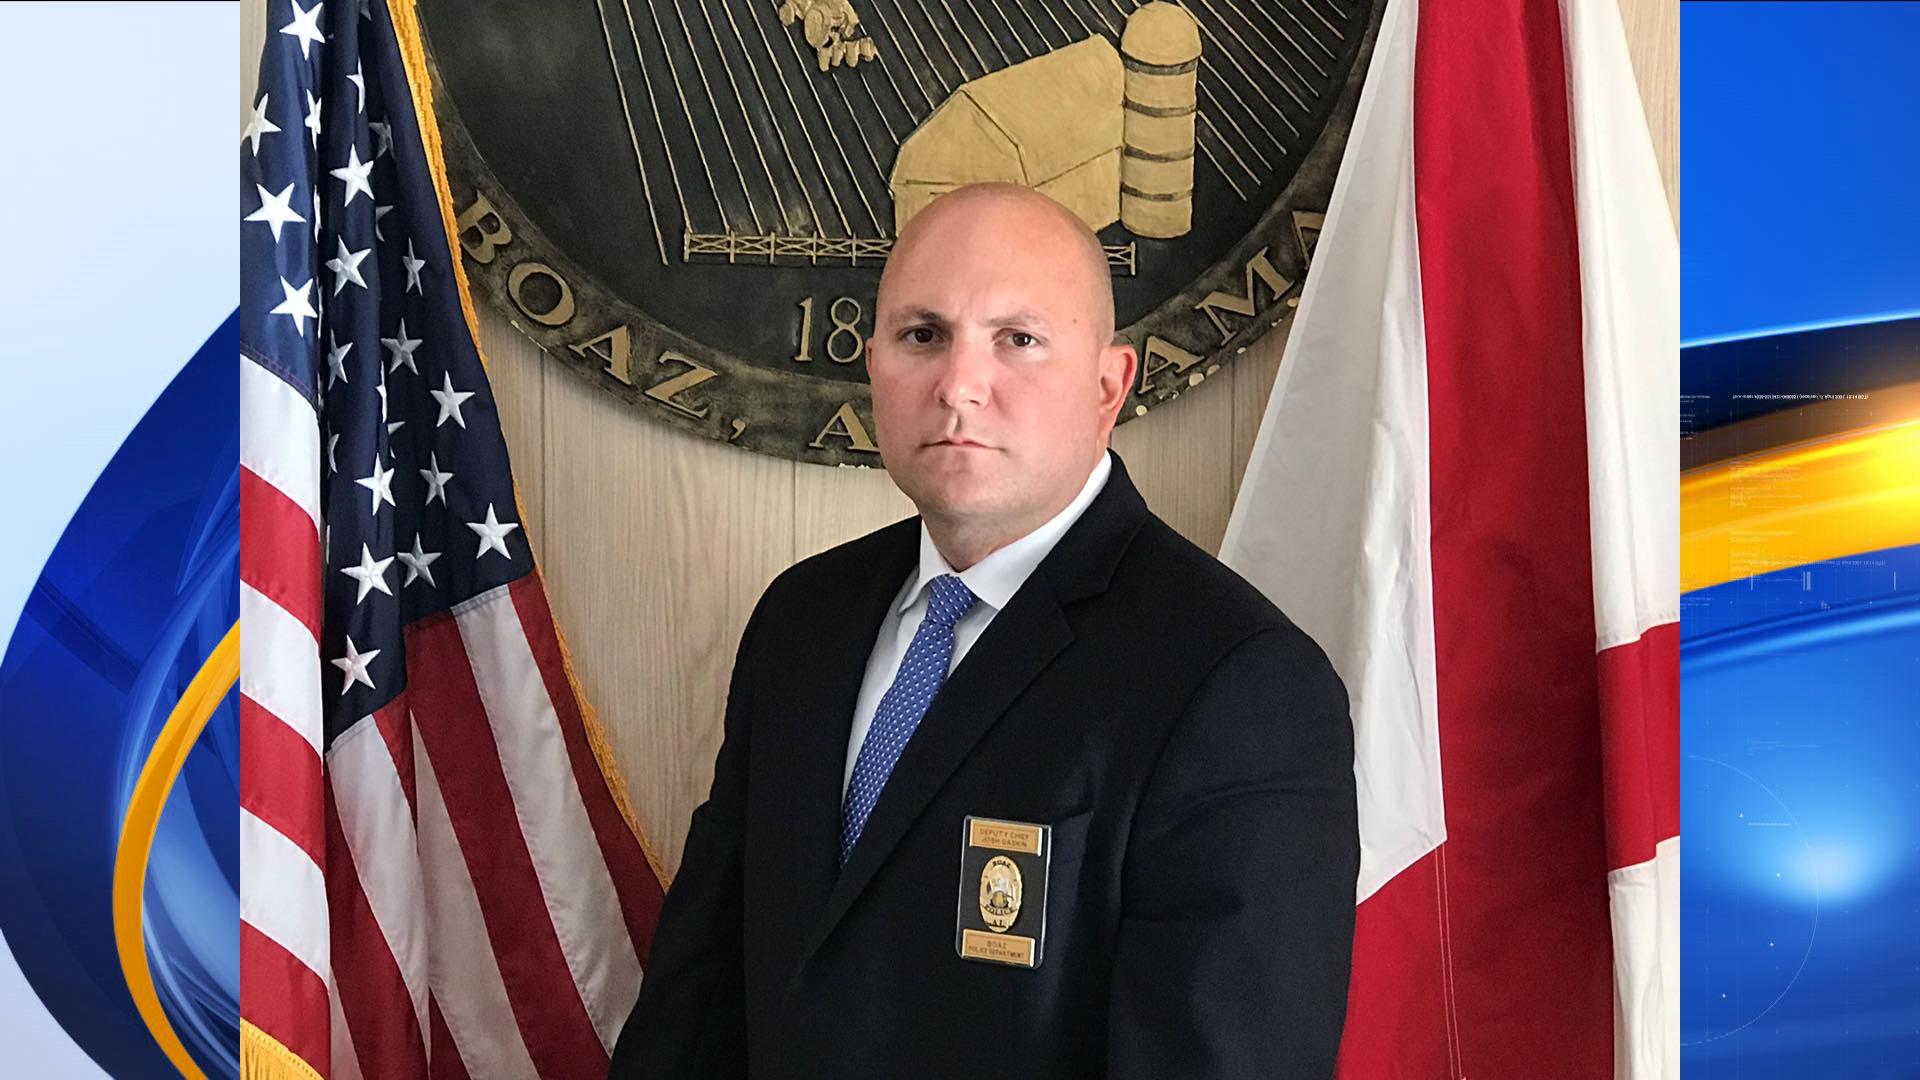 Boaz Police Chief Josh Gaskin said he will always consider Boaz home as he moves onto ALEA.